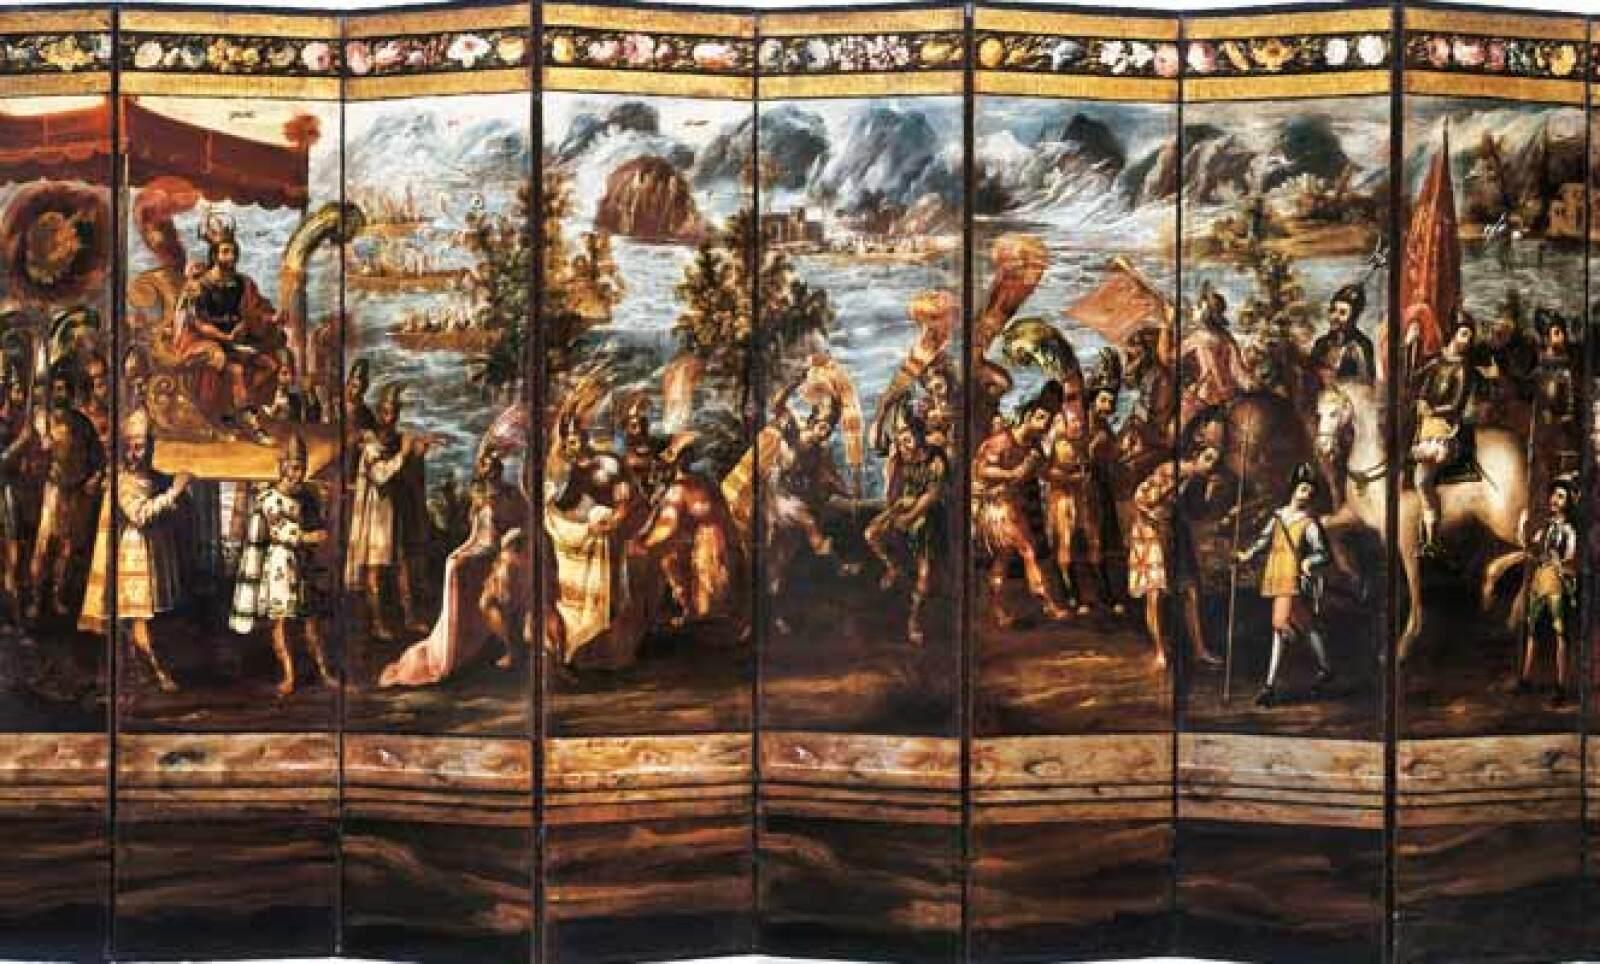 Autor: Juan Correa (ca. 1645-1717). Material: Óleo sobre tela. Tamaño: 250 x 600 cm. Origen: Col. Banco Nacional de México.